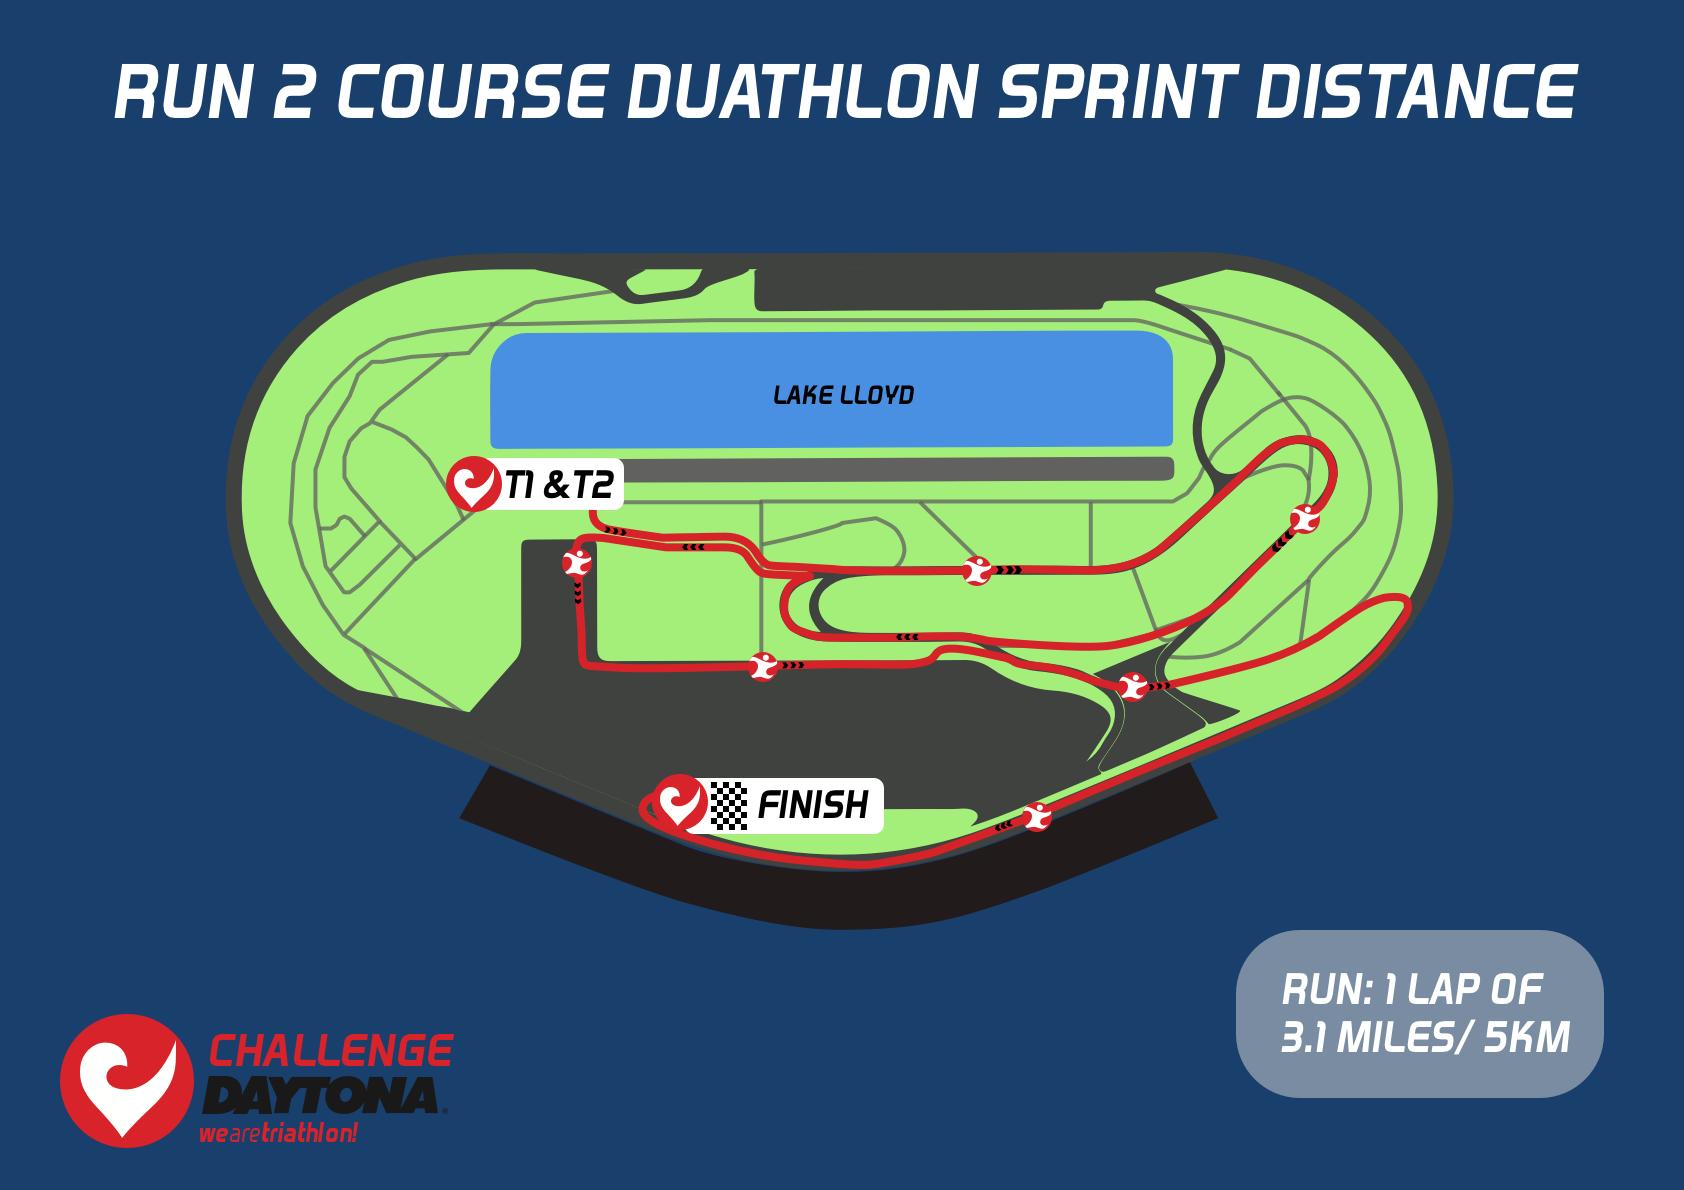 Duathlon Sprint Distance